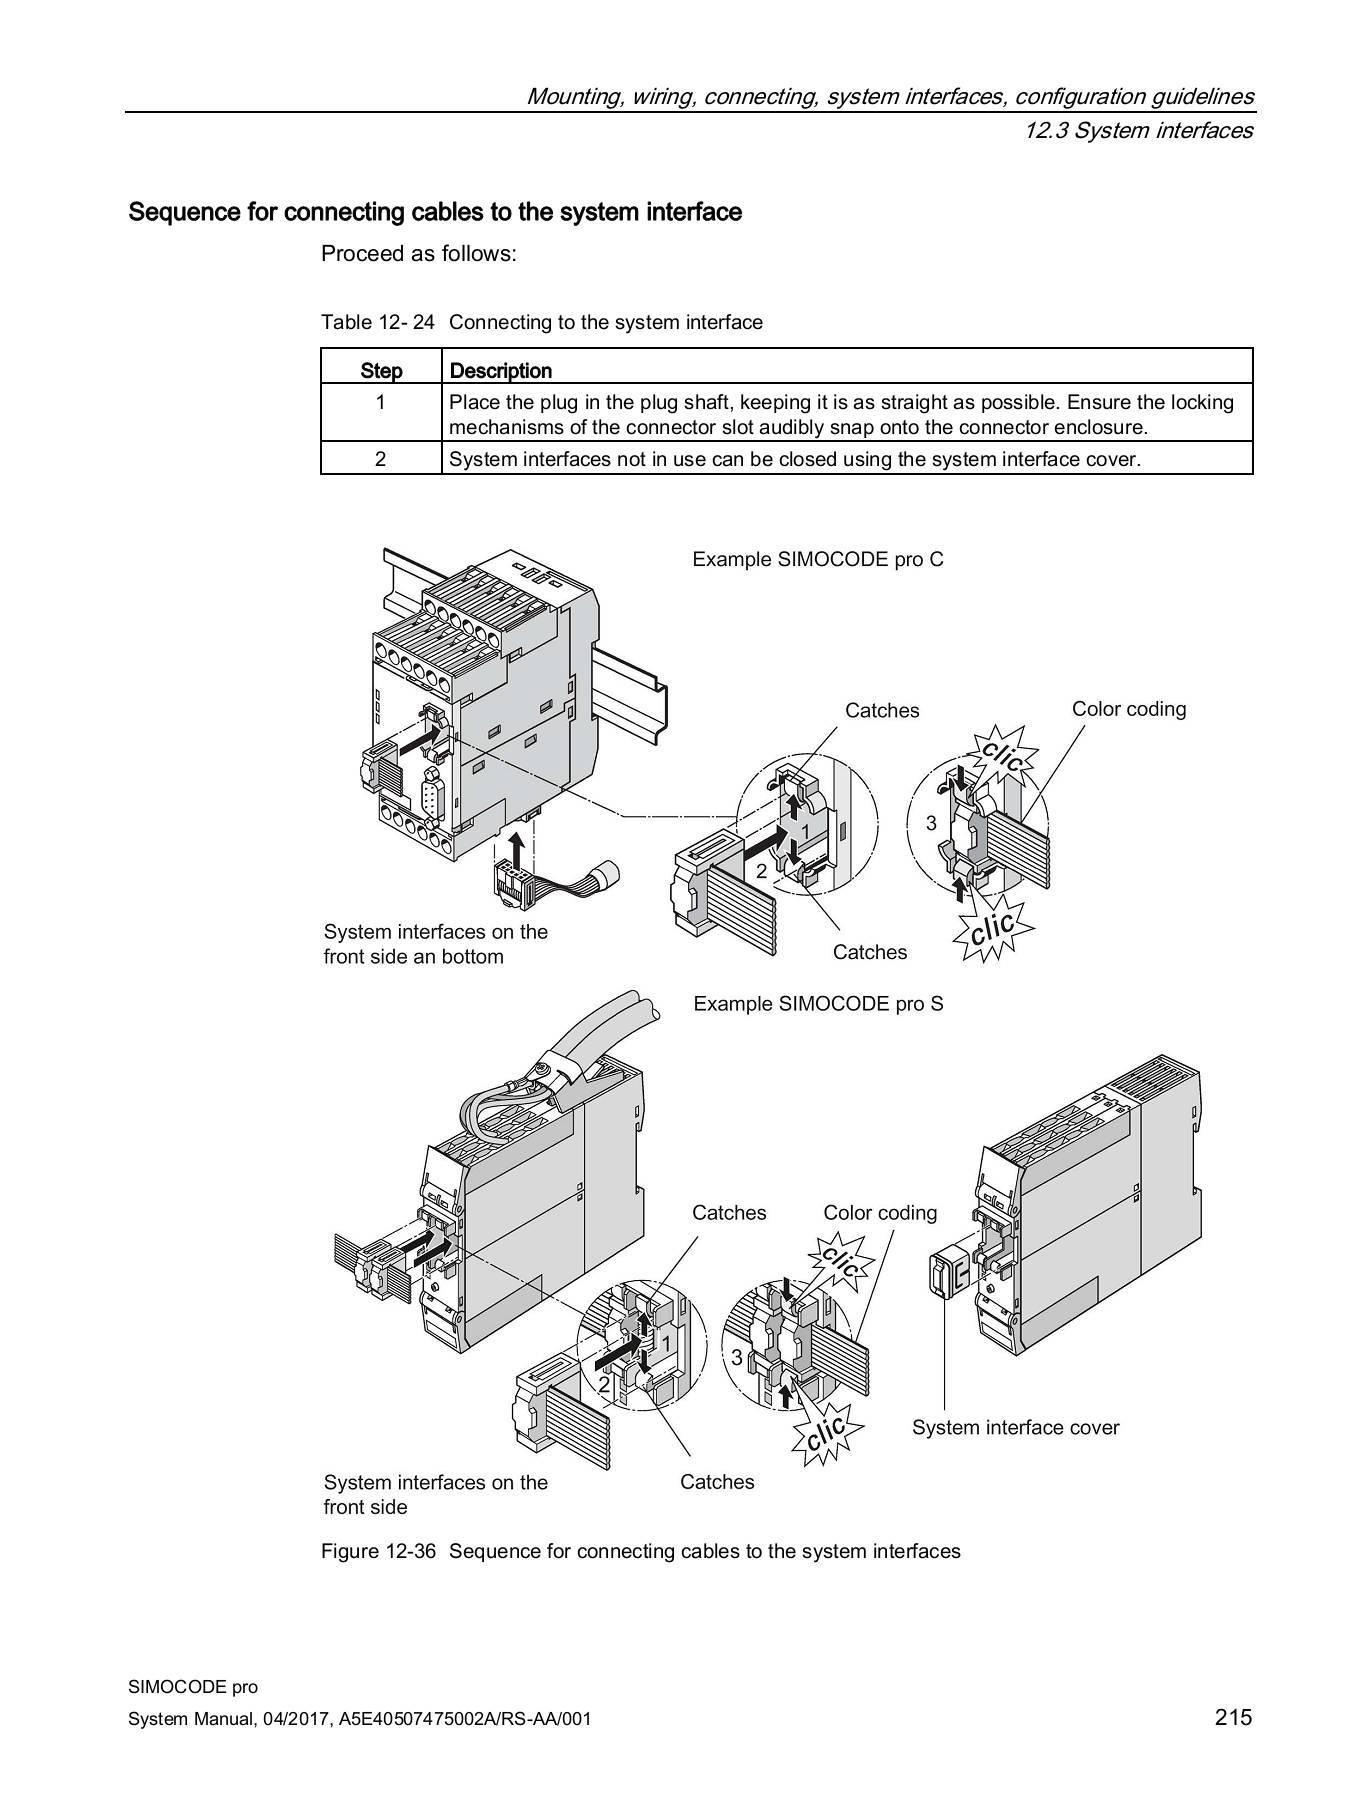 Simocode Pro V Wiring Diagram